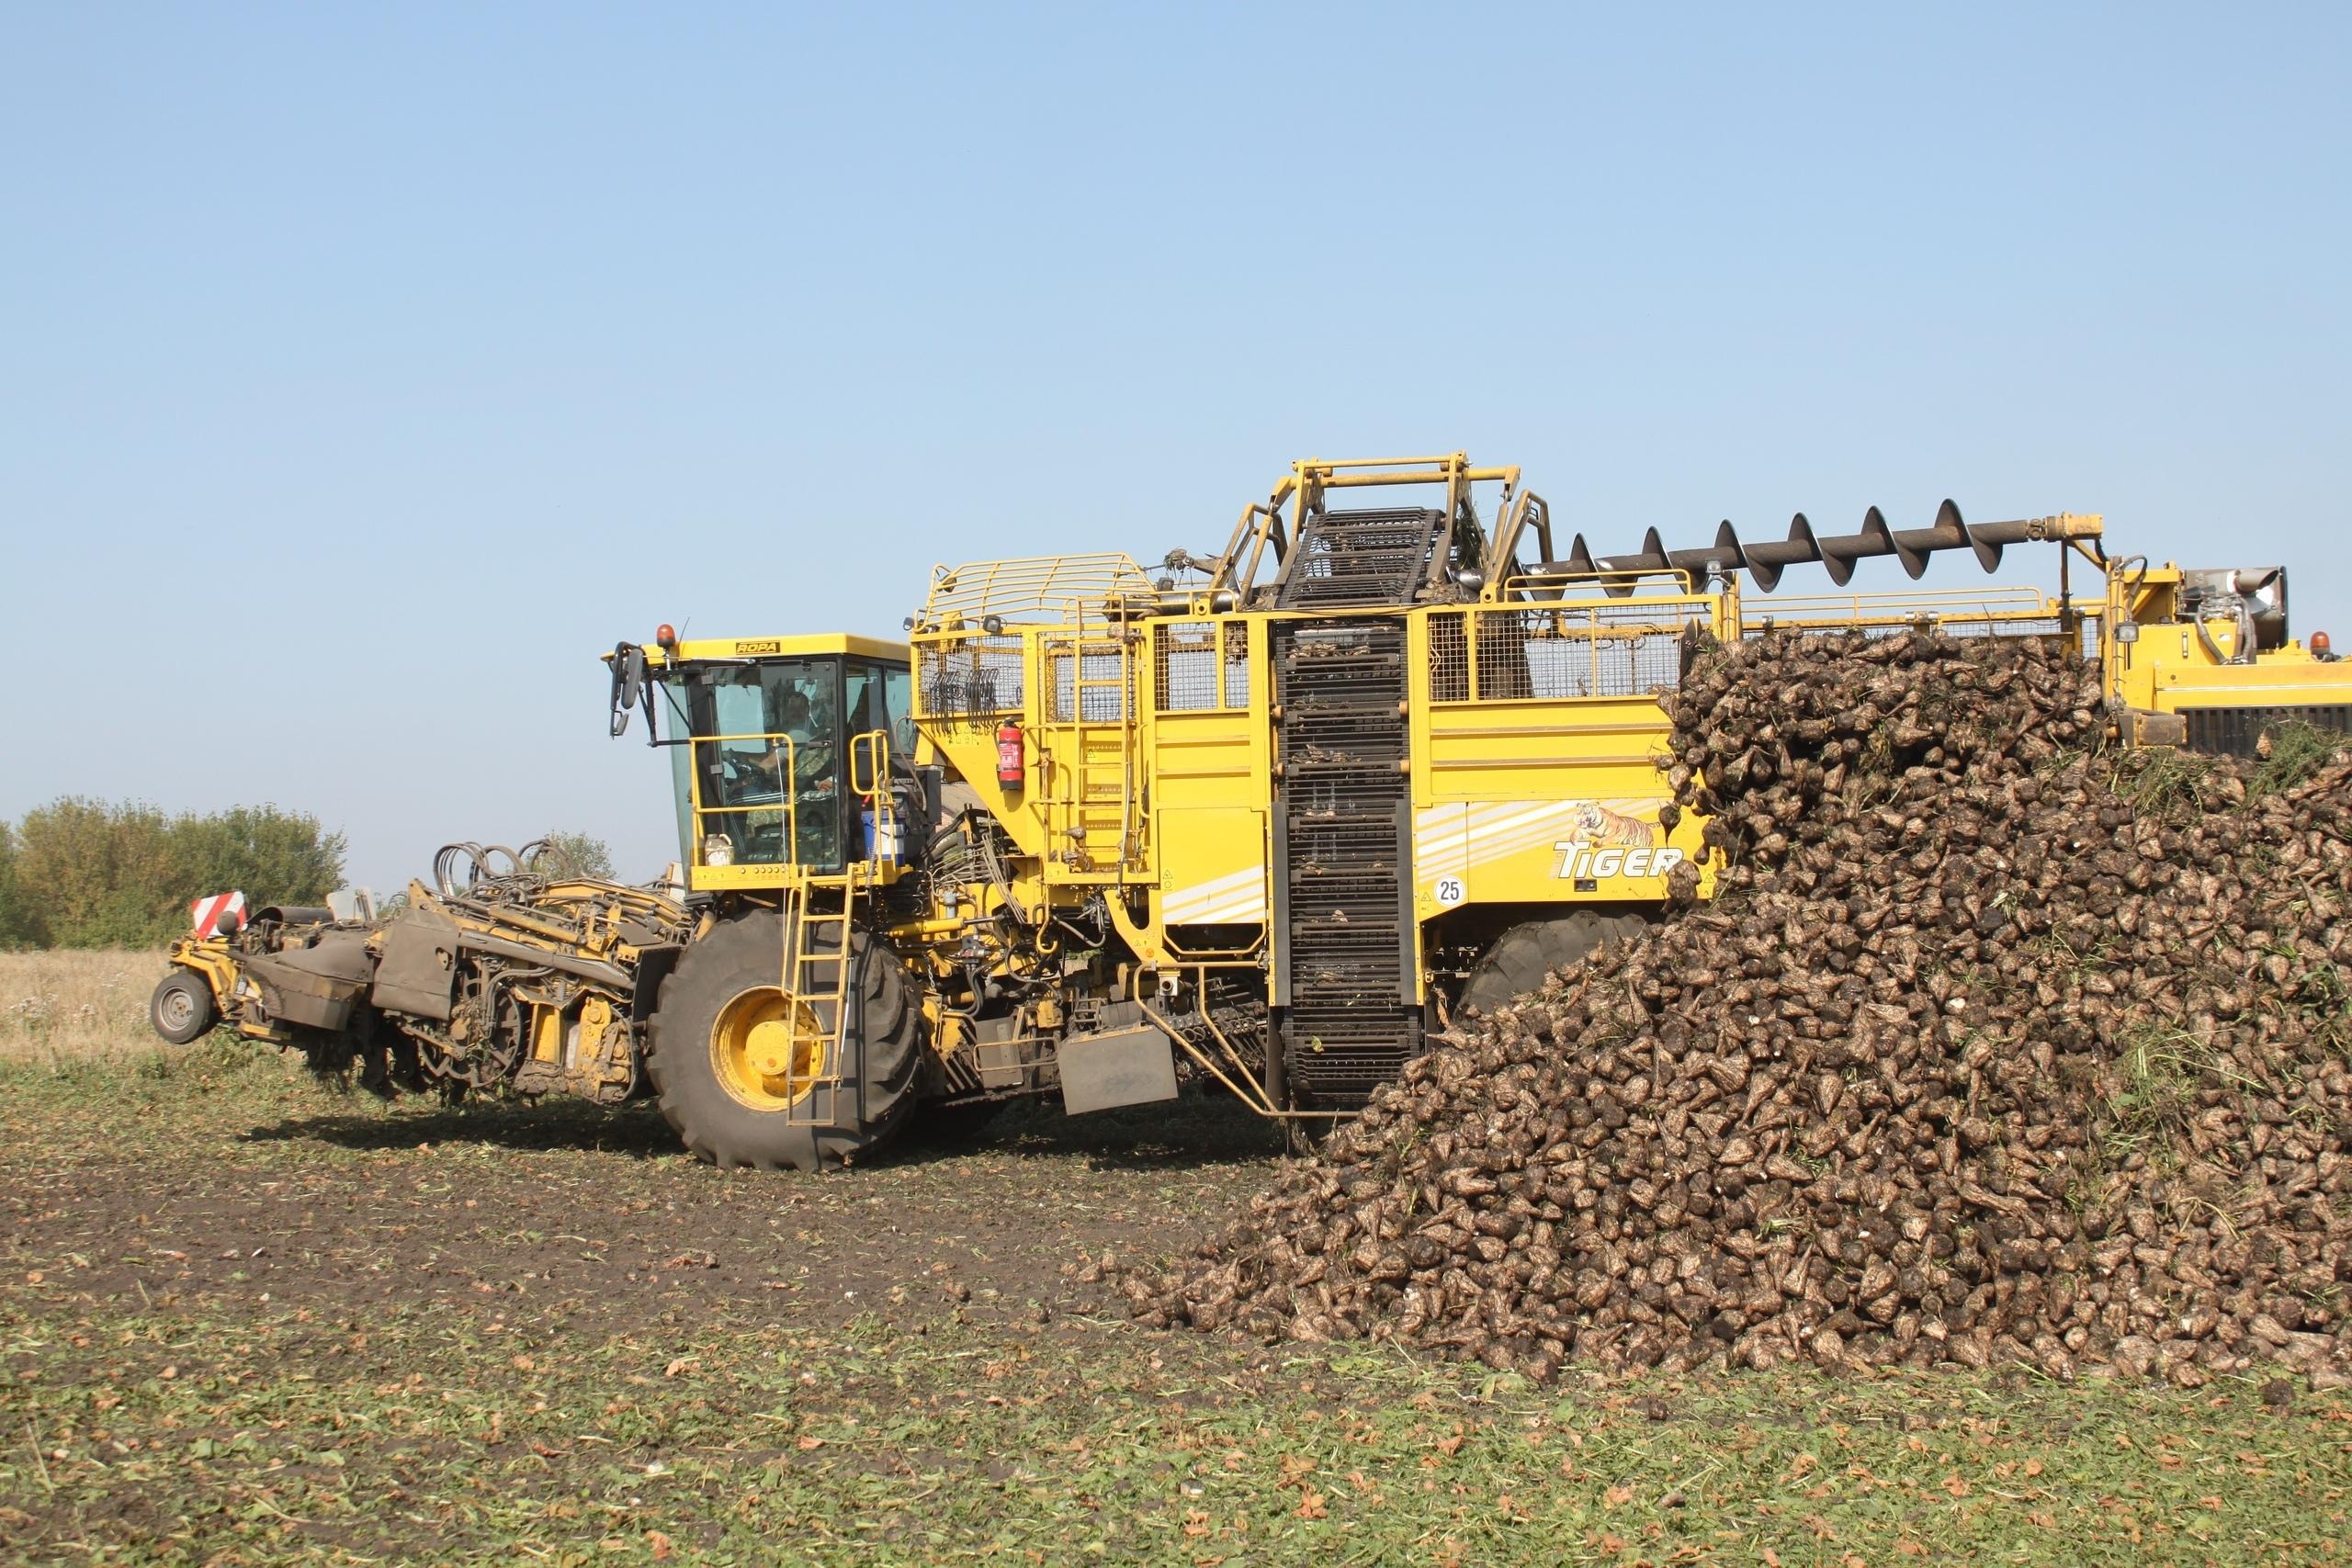 Аграрии собрали 3 миллиона тонн сахарной свёклы